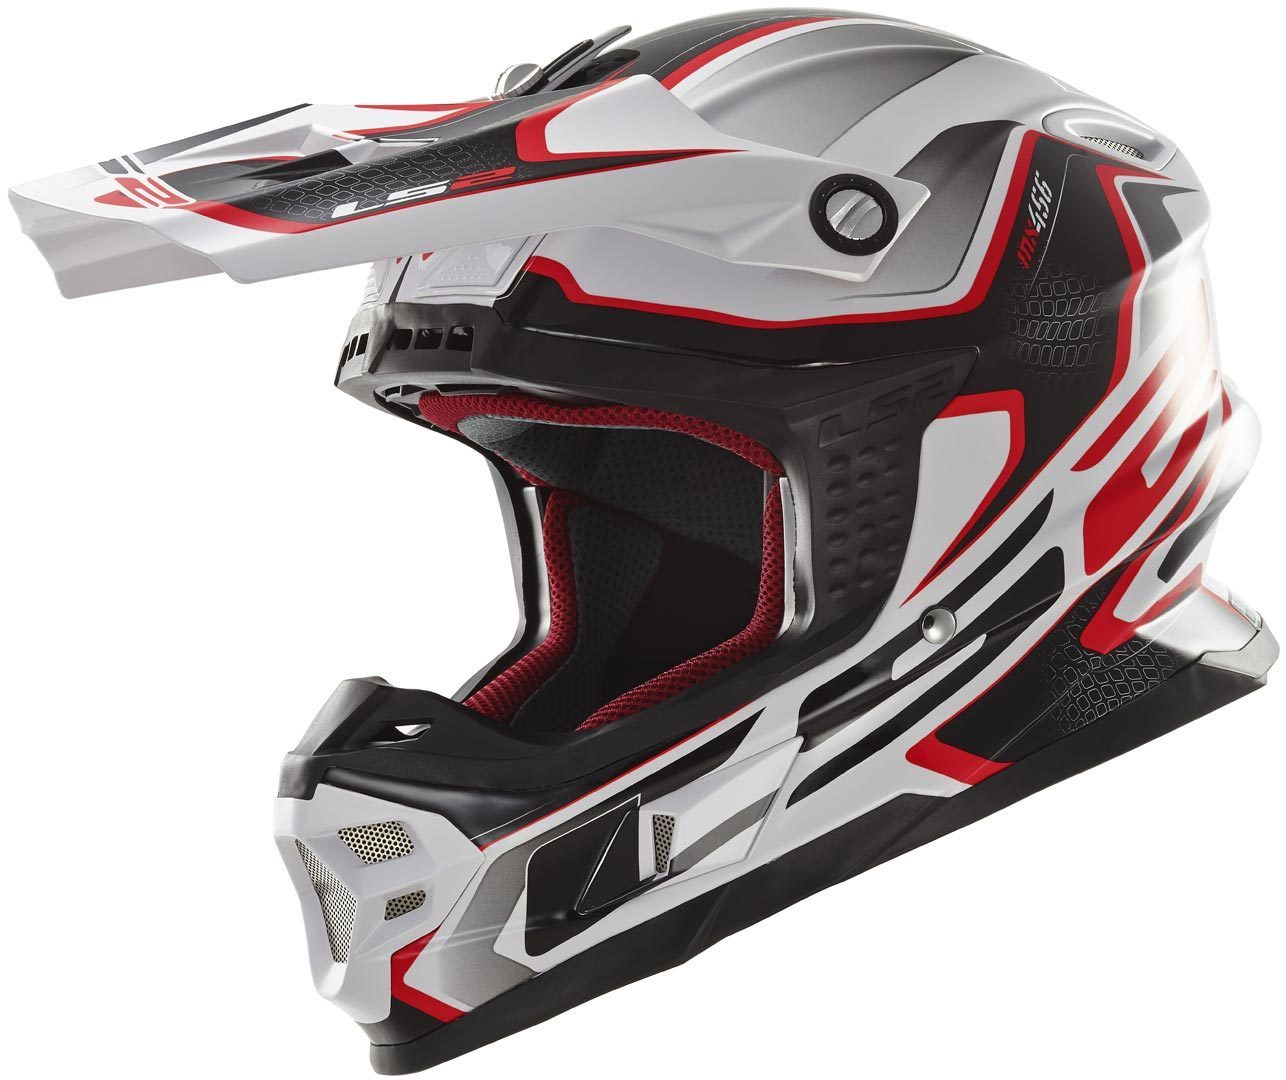 Ls2 MX456 Compass Cross Motosiklet Kaskı